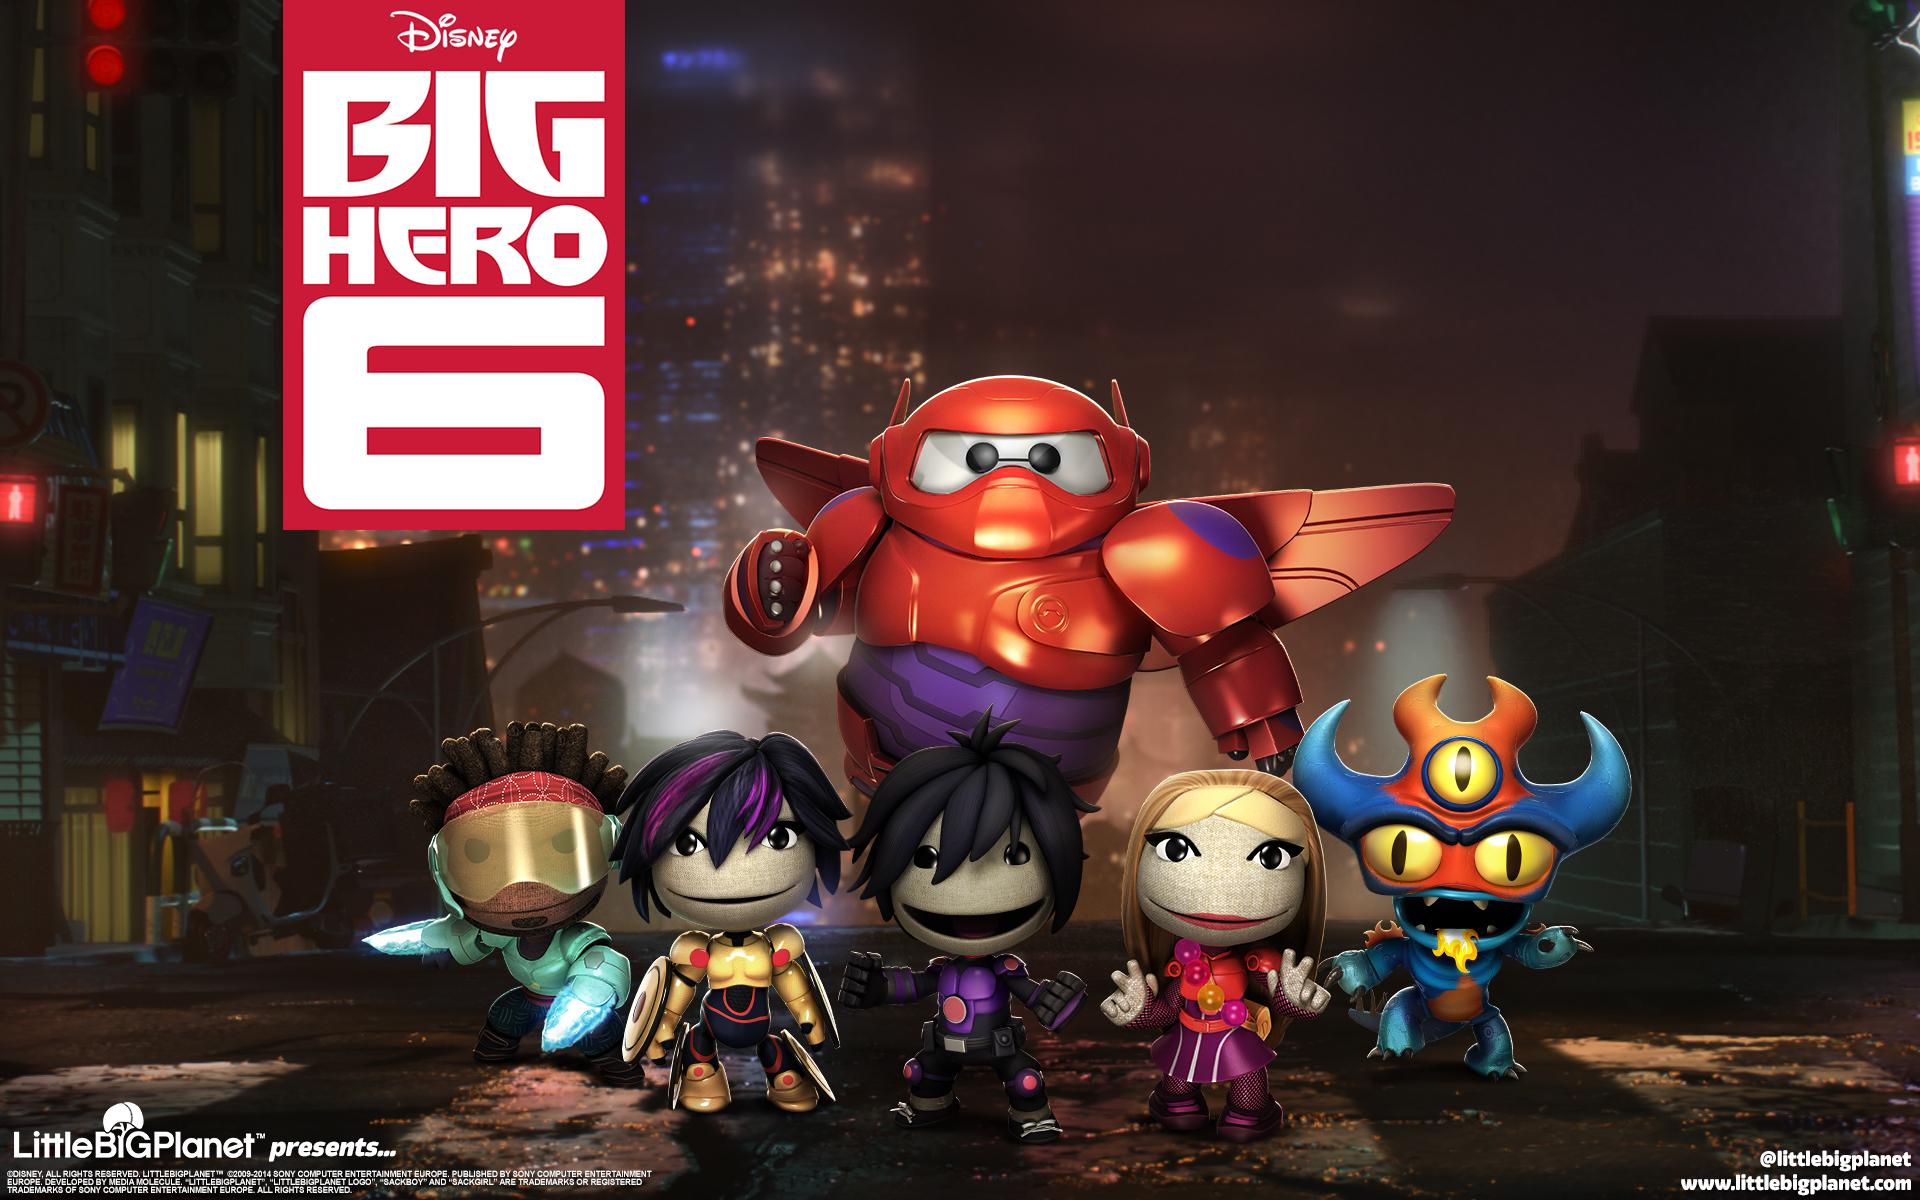 HD Wallpapers LittleBigPlanet Big Hero 6